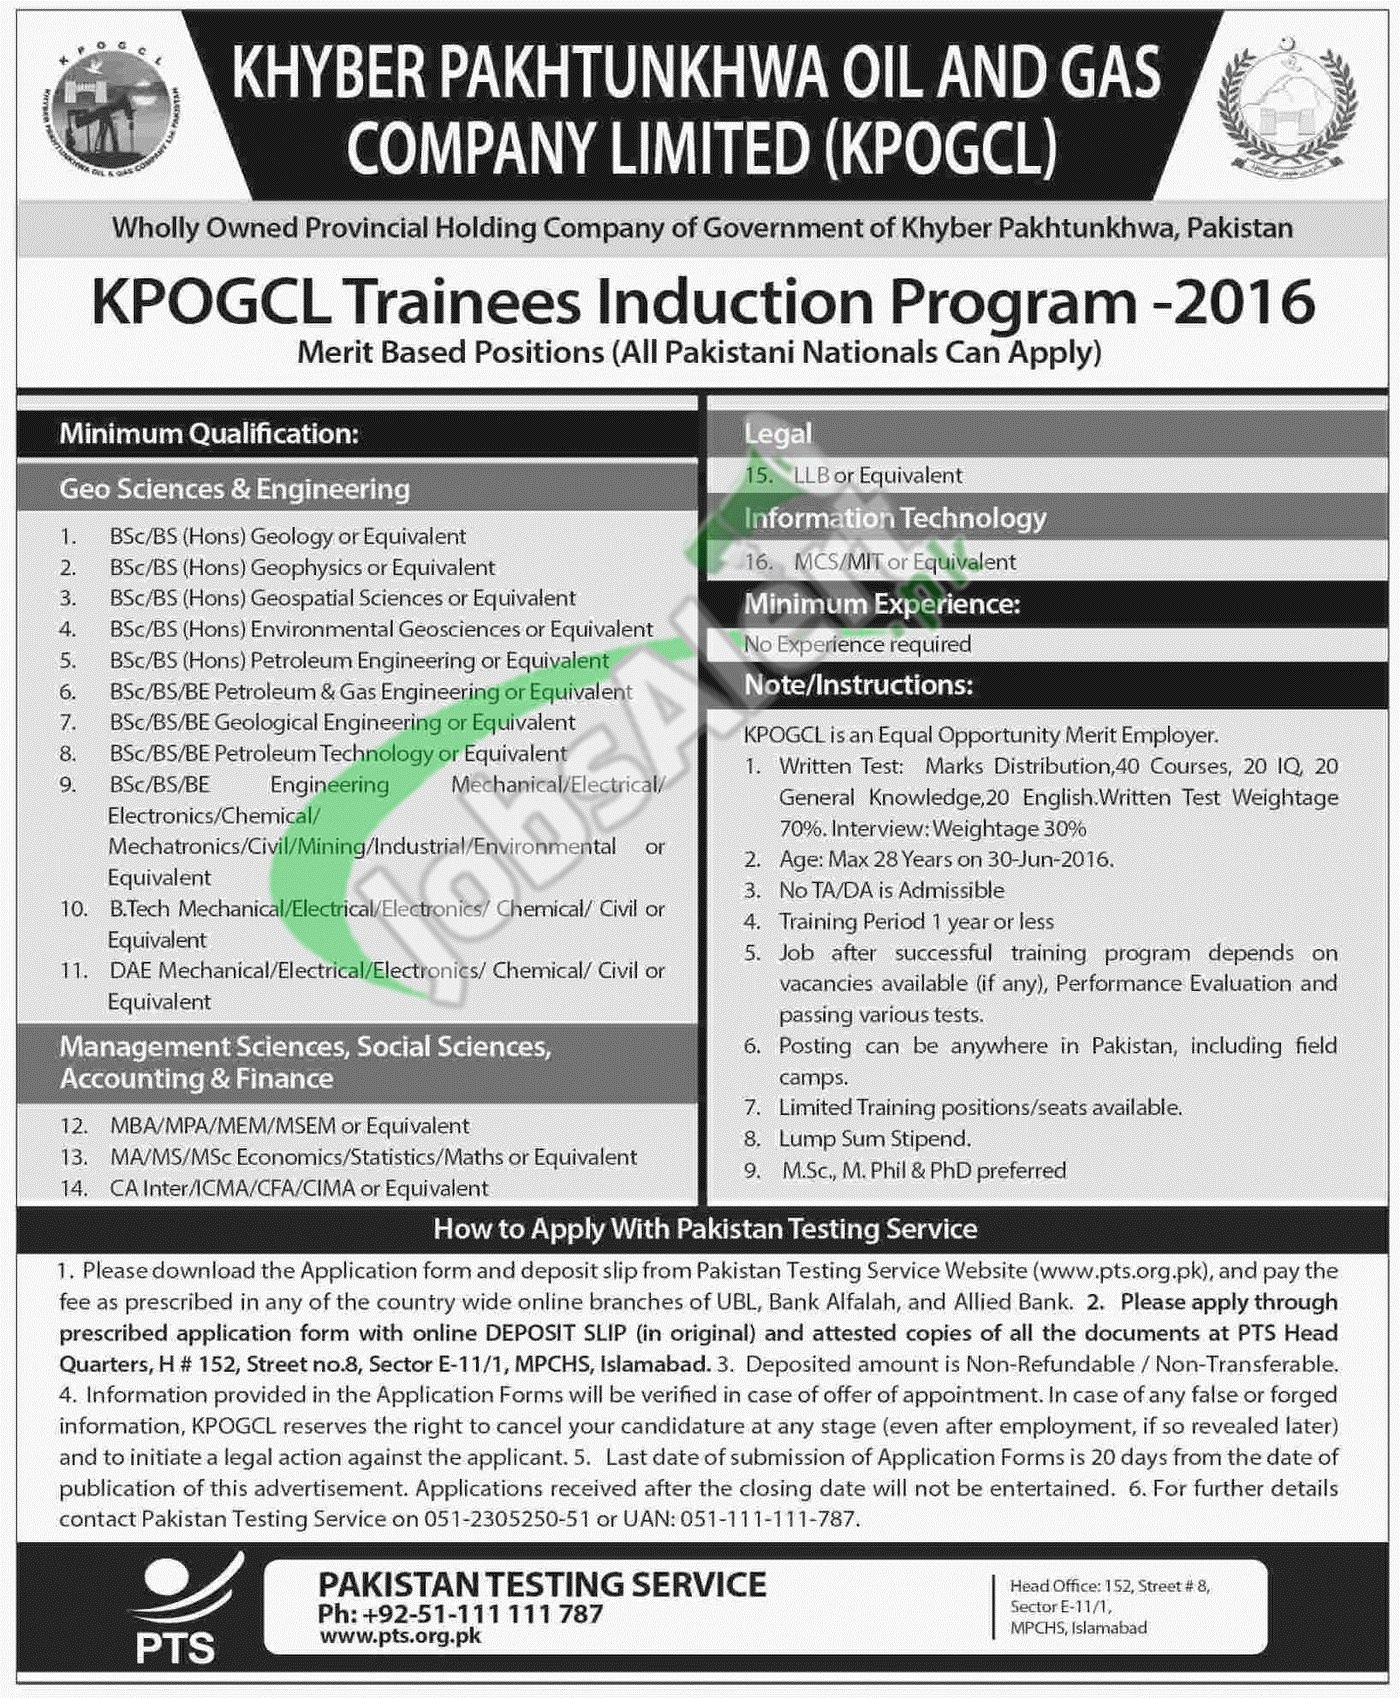 KPOGCL Trainees Induction Program 2016